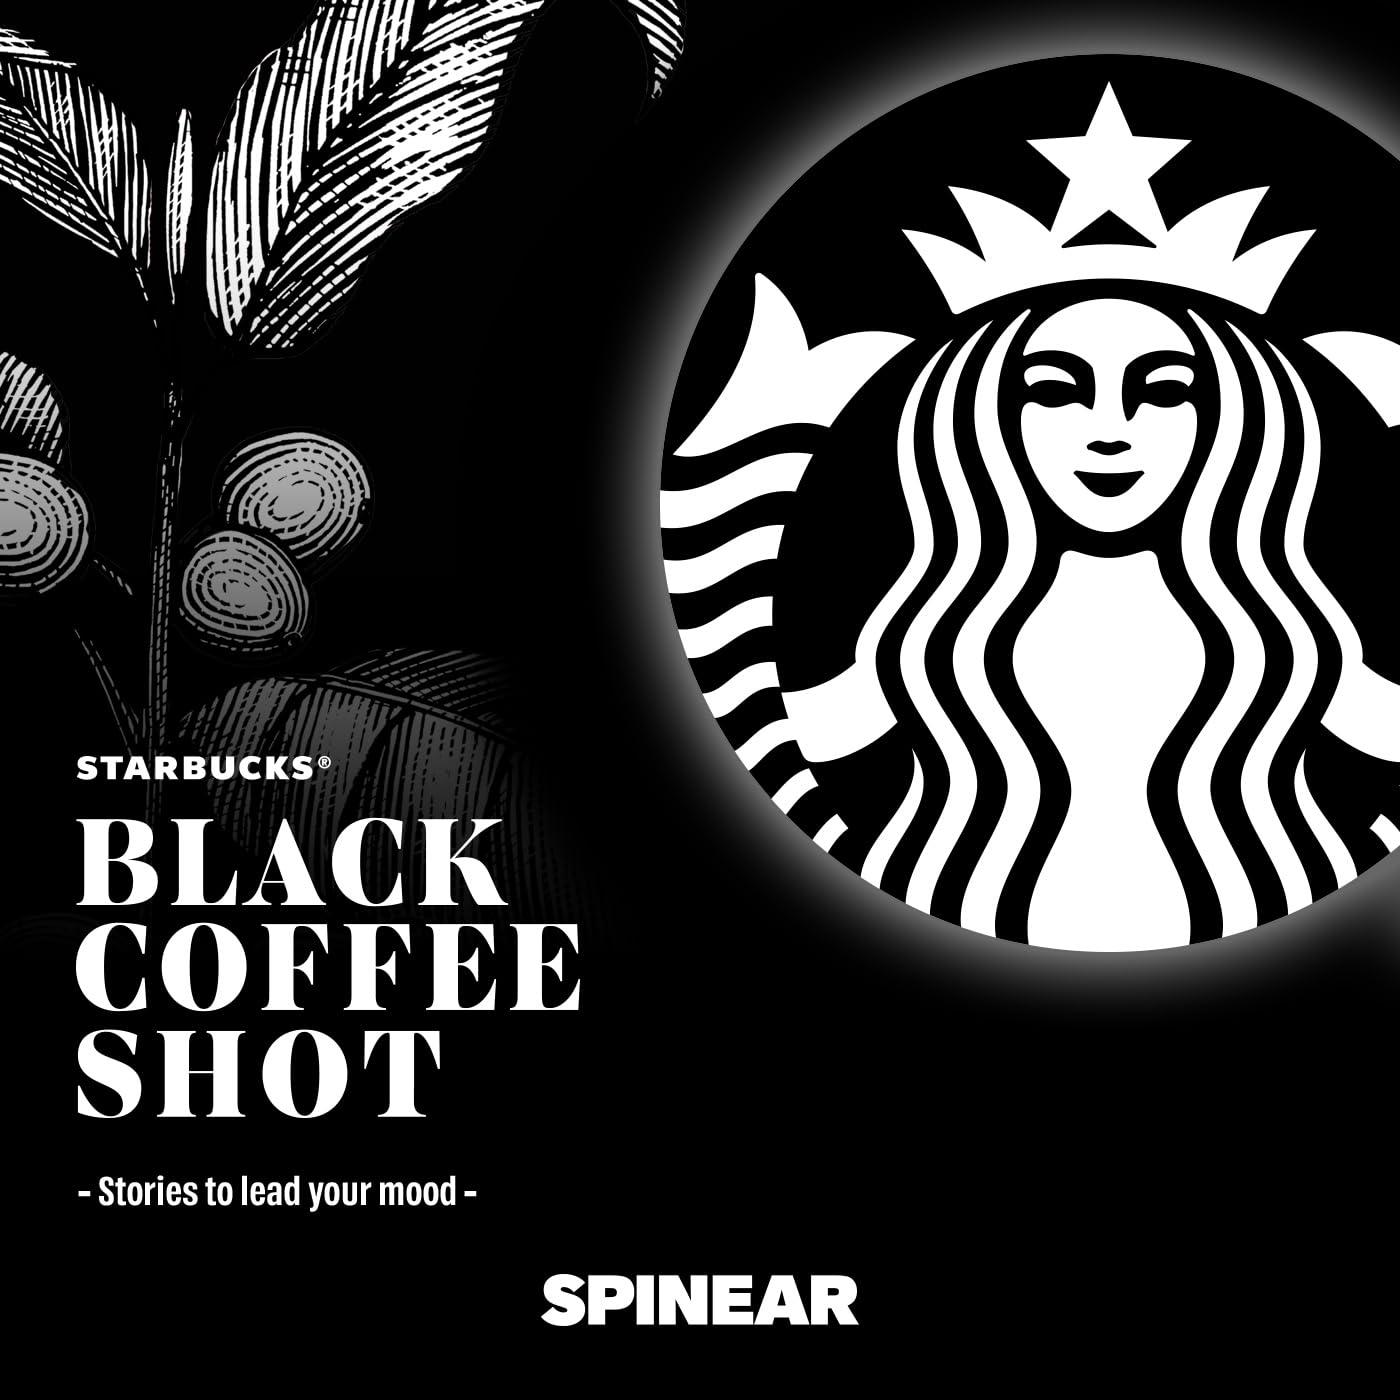 STARBUCKS® BLACK COFFEE SHOT -Stories to lead your mood-